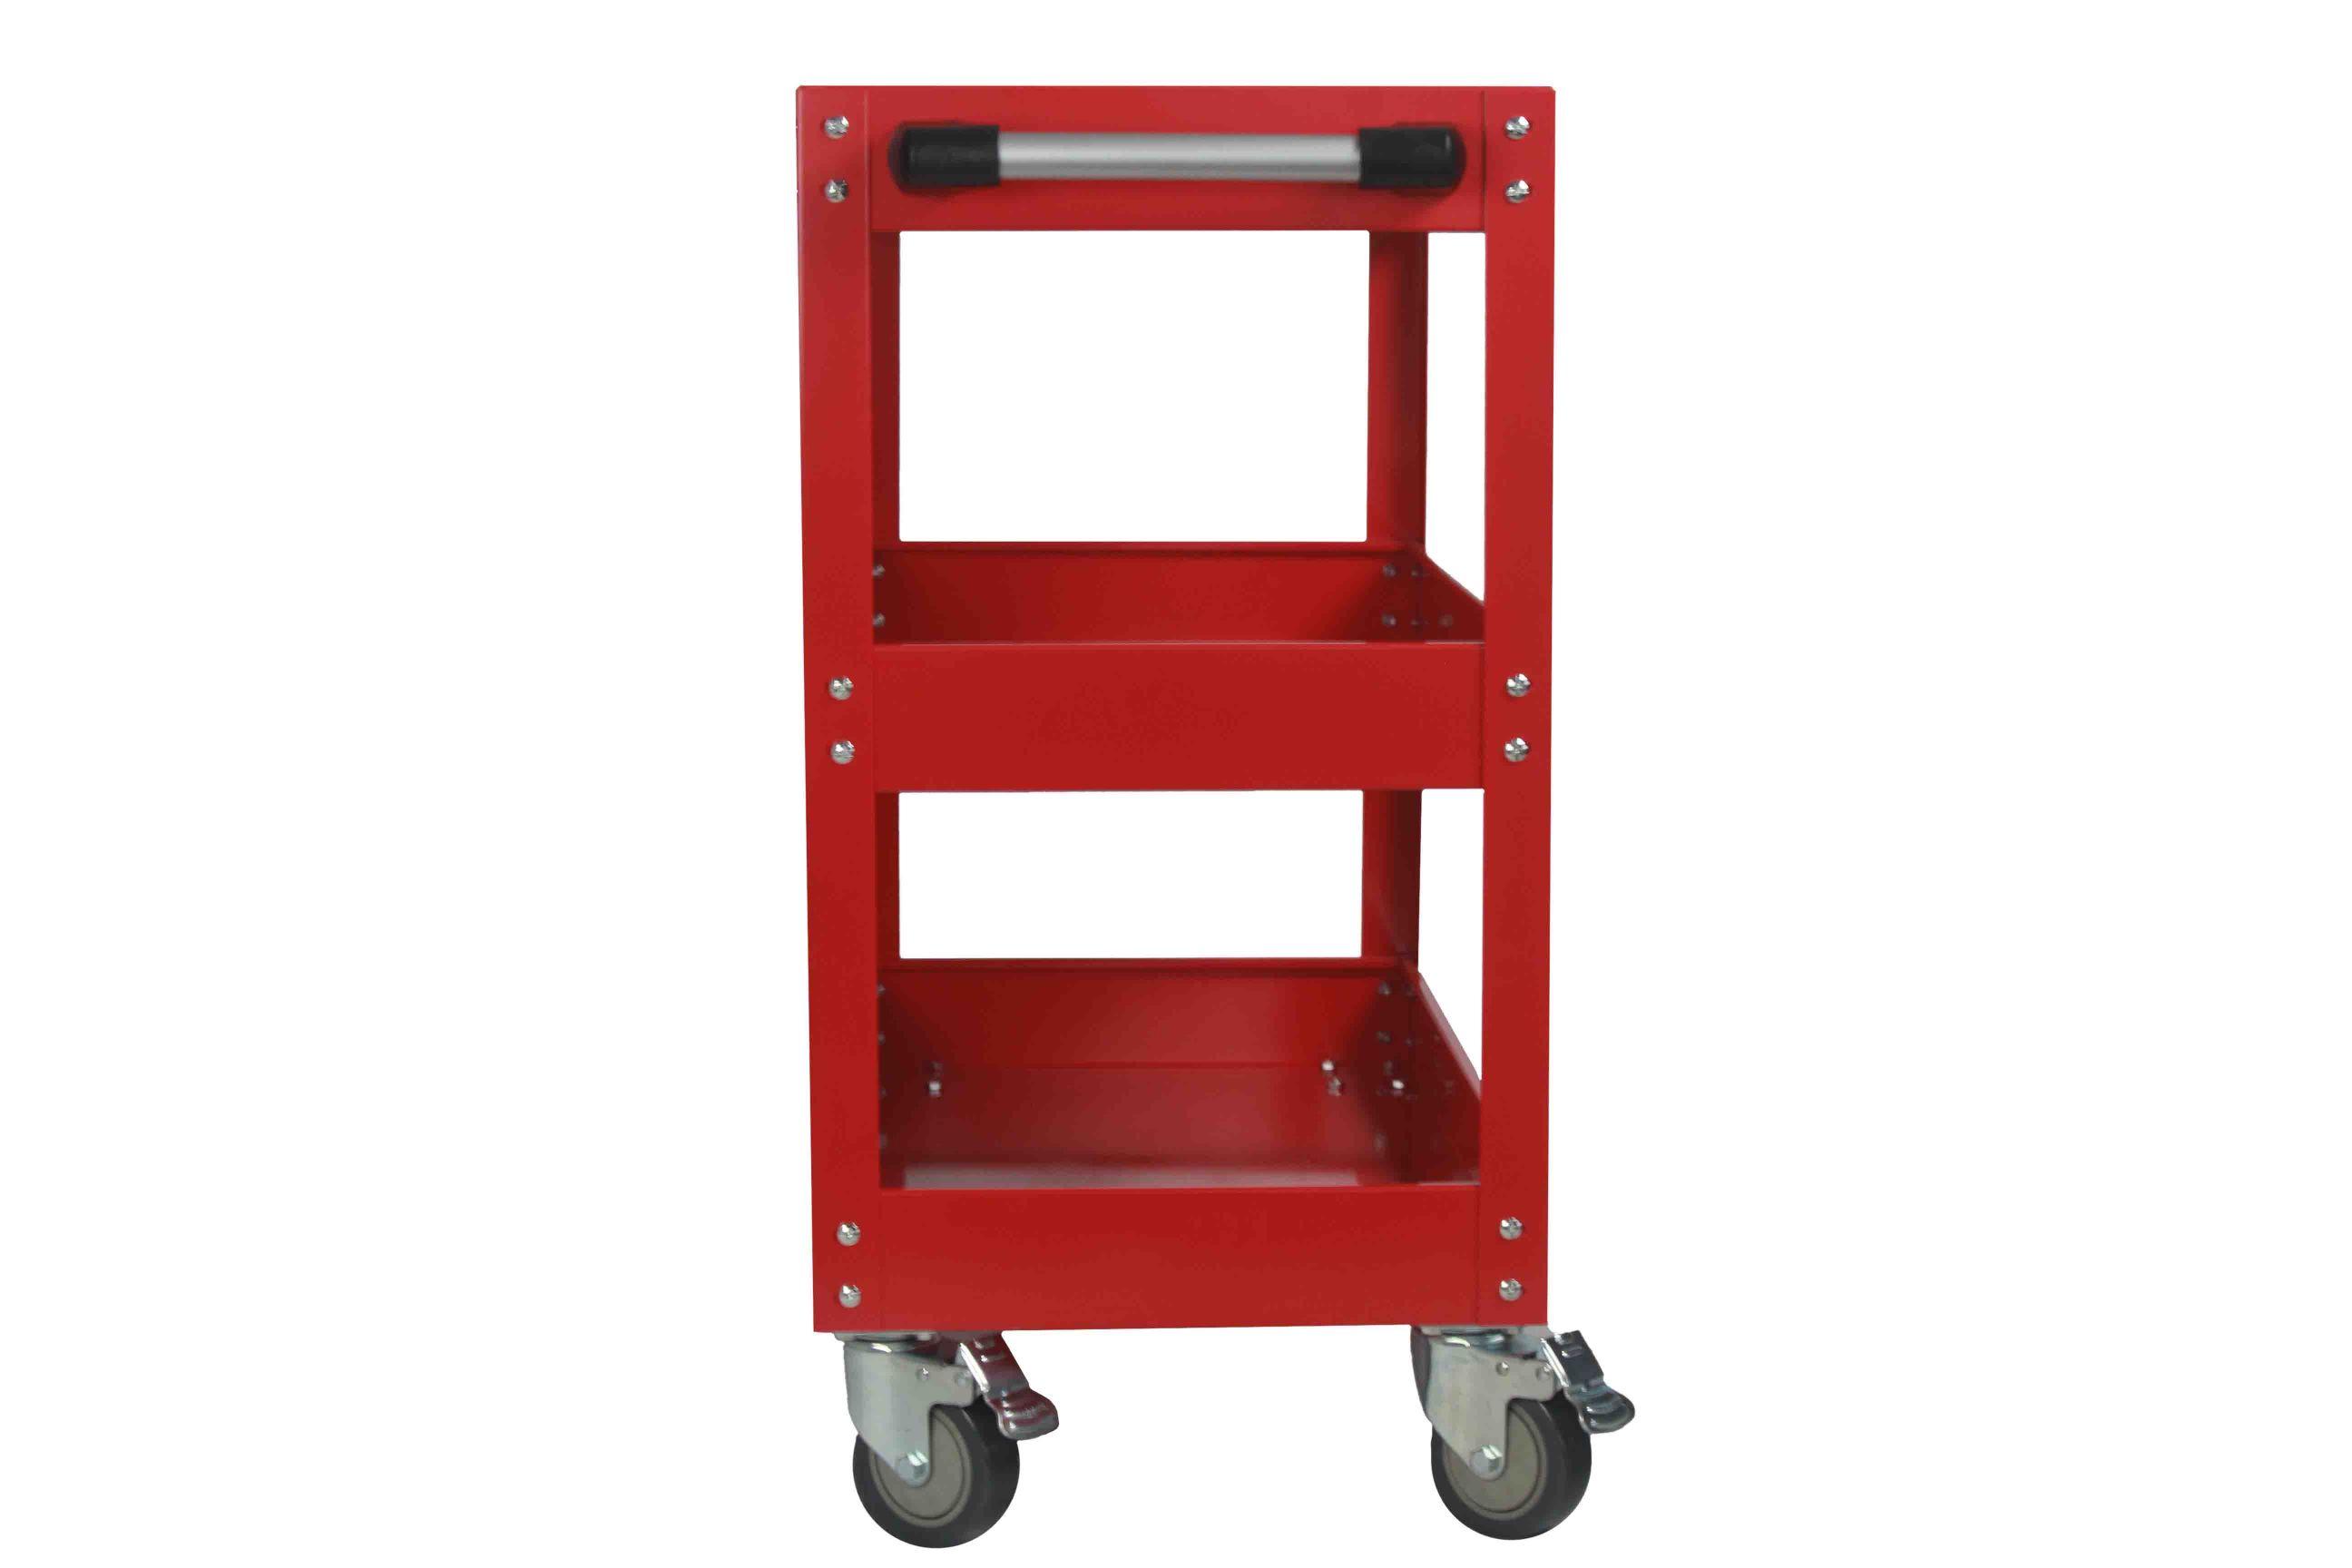 New ESSupplier Bigger & Wider Tool Trolley Cart Storage  Red